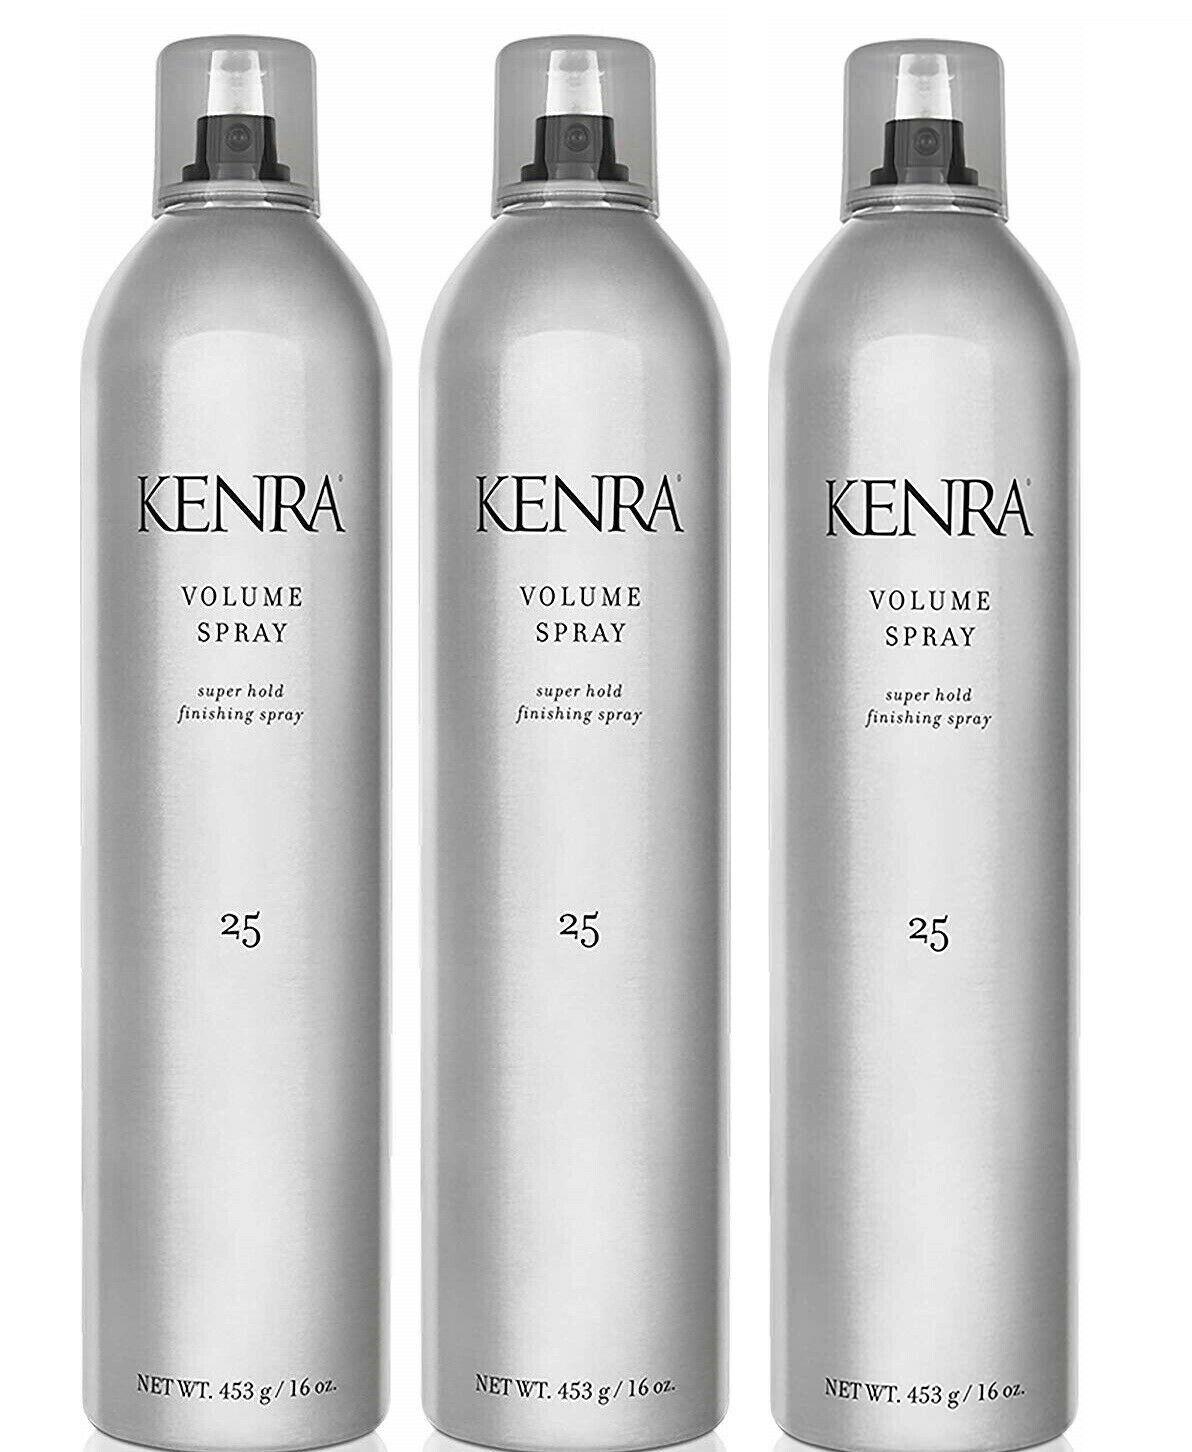 Kenra # 25 Volume Spray 16 Oz Each, Pack of 3 Cans, Super Ho